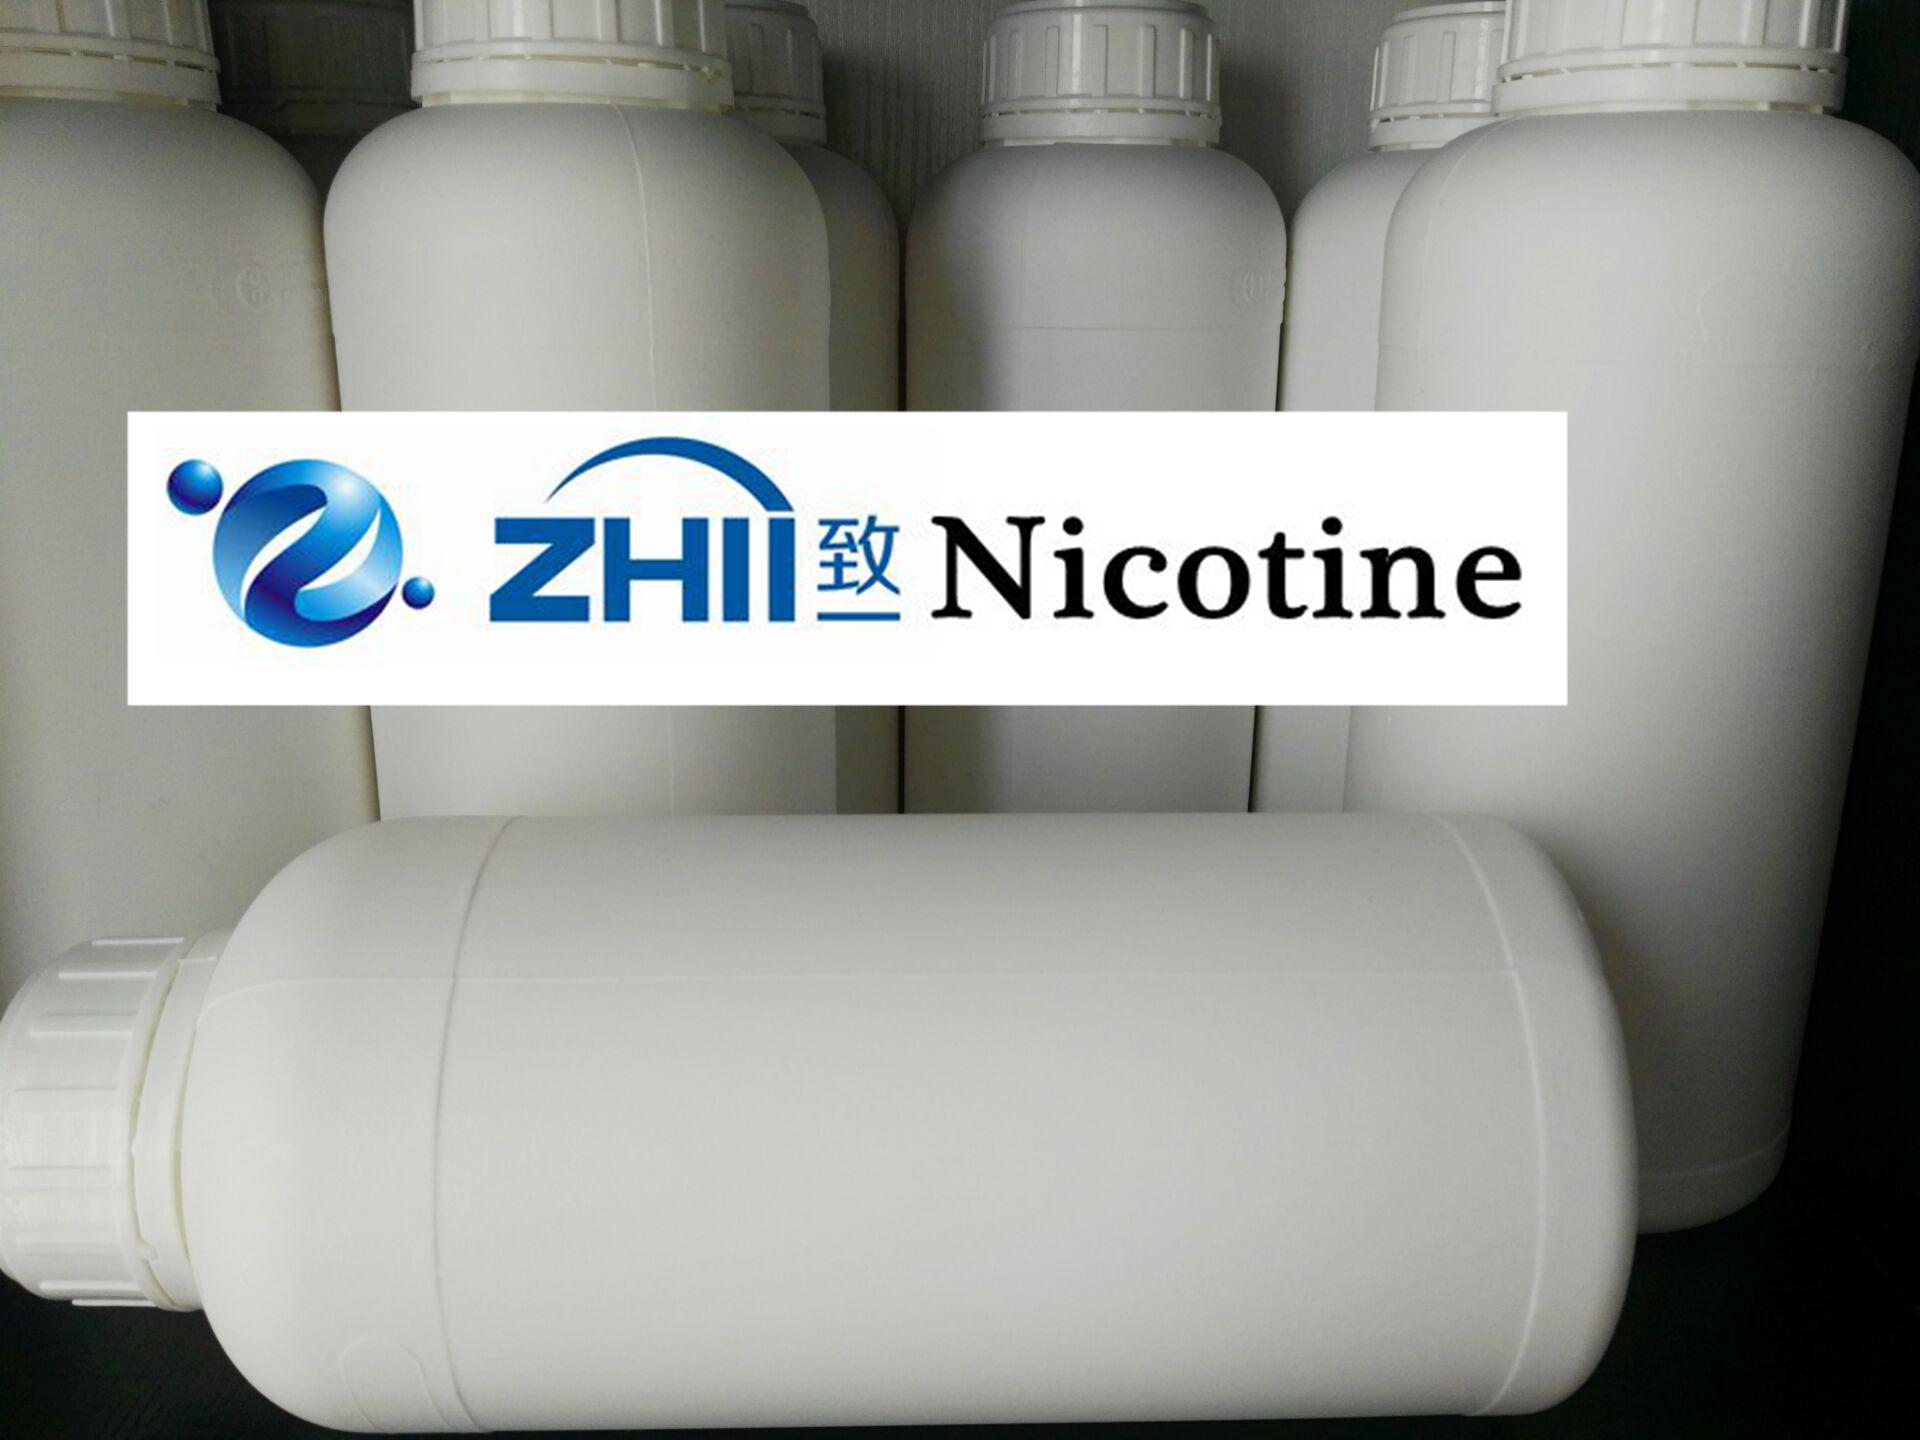 ZHII Pure nicotine usp nicotine eliquid nicotine ejuice nicotine liquid nicotine